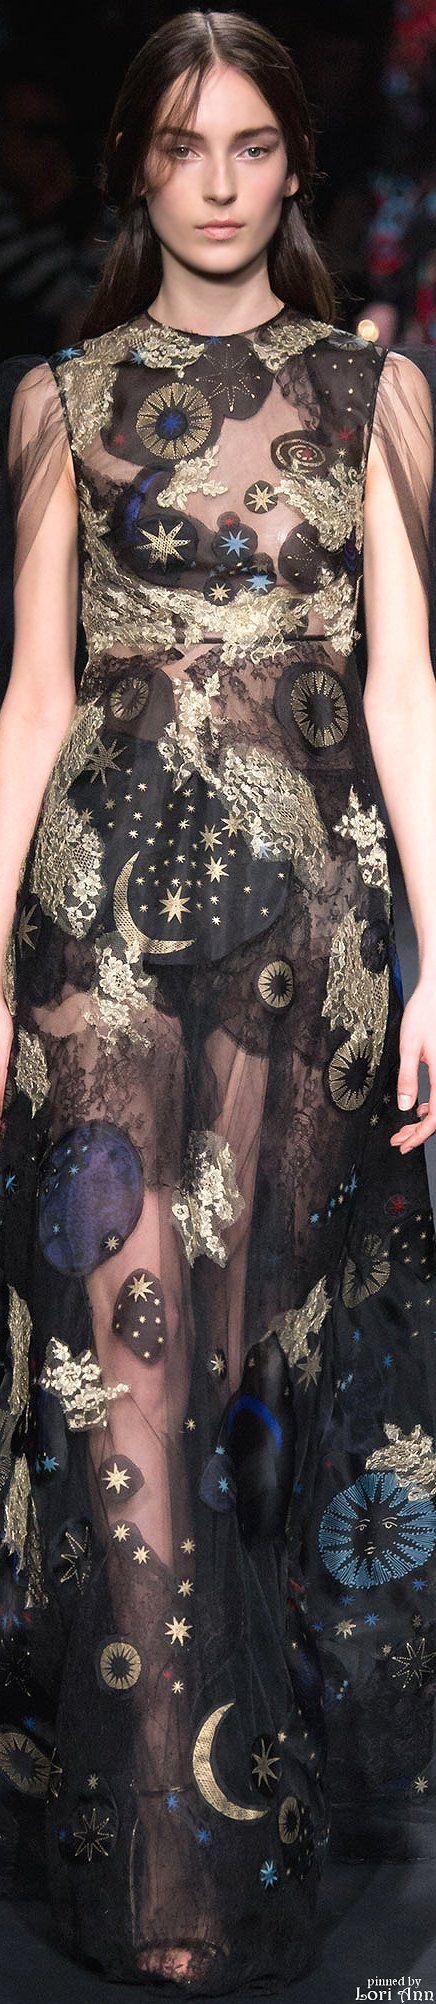 Valentino solar system dress fantasy fashion nerdy fashionista #UNIQUE_WOMENS_FASHION